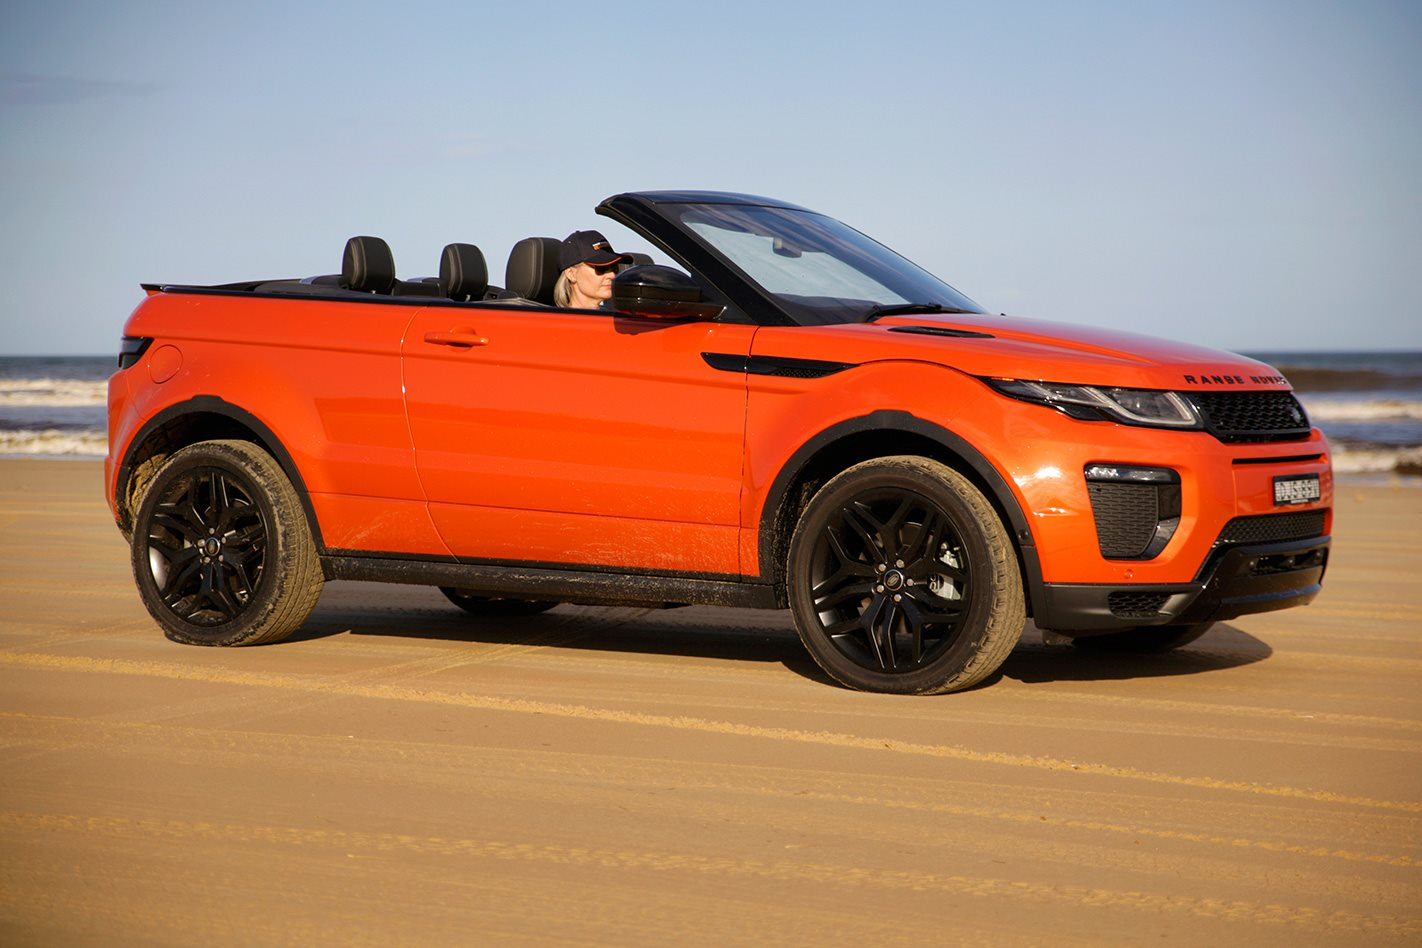 2017 range rover evoque convertible review wheels. Black Bedroom Furniture Sets. Home Design Ideas